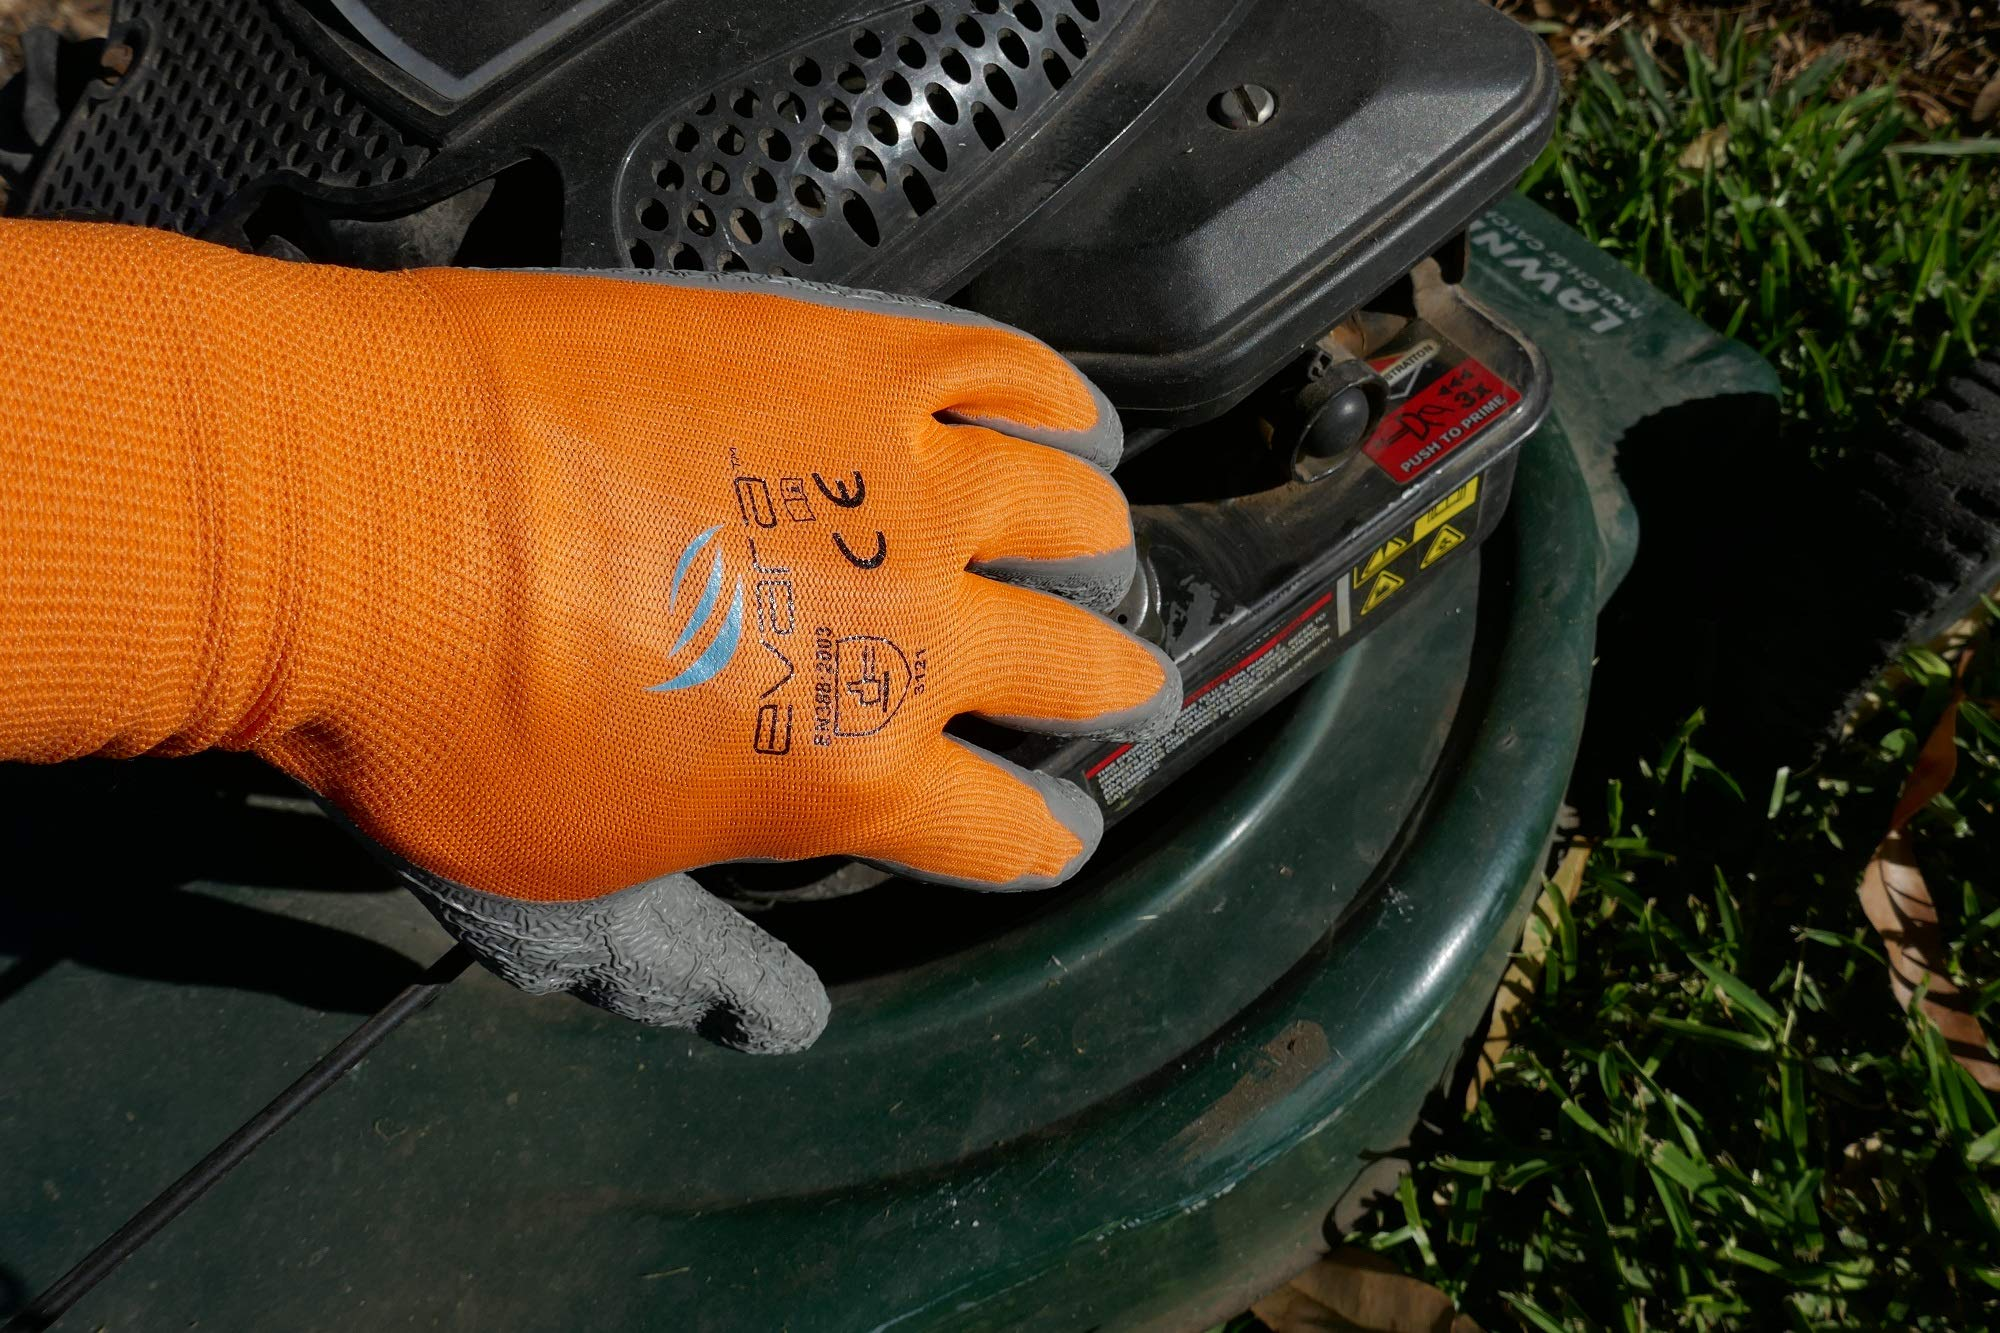 Tough Work and Gardening Gloves for Men and Women(12 pairs per pack) (Latex, Medium) Supreme Hi-vis orange with full thumb dipping by Evara by Evara (Image #4)